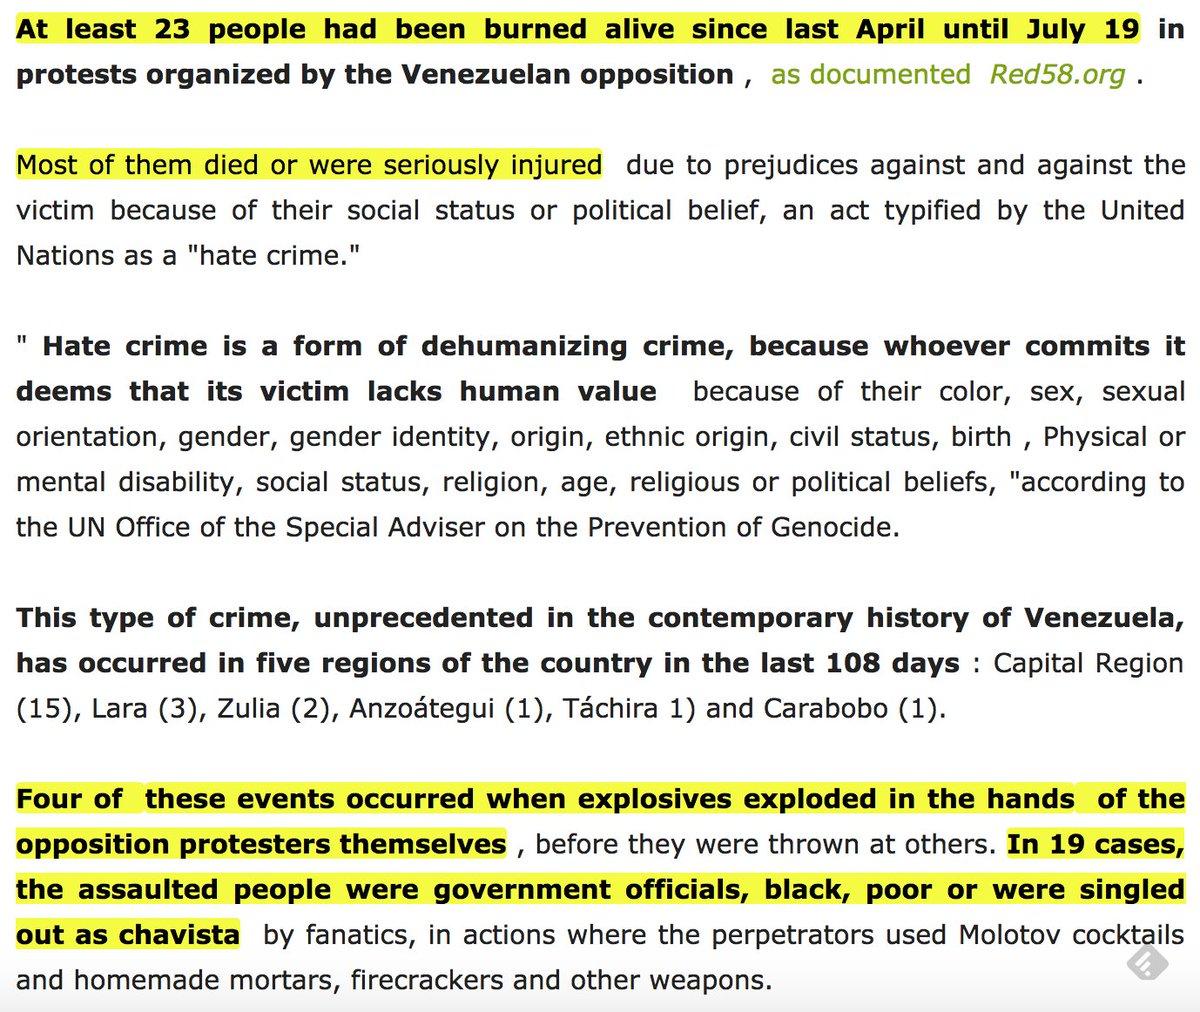 A Lutacontinua On Twitter Venezuela At Least 23 Burned Alive